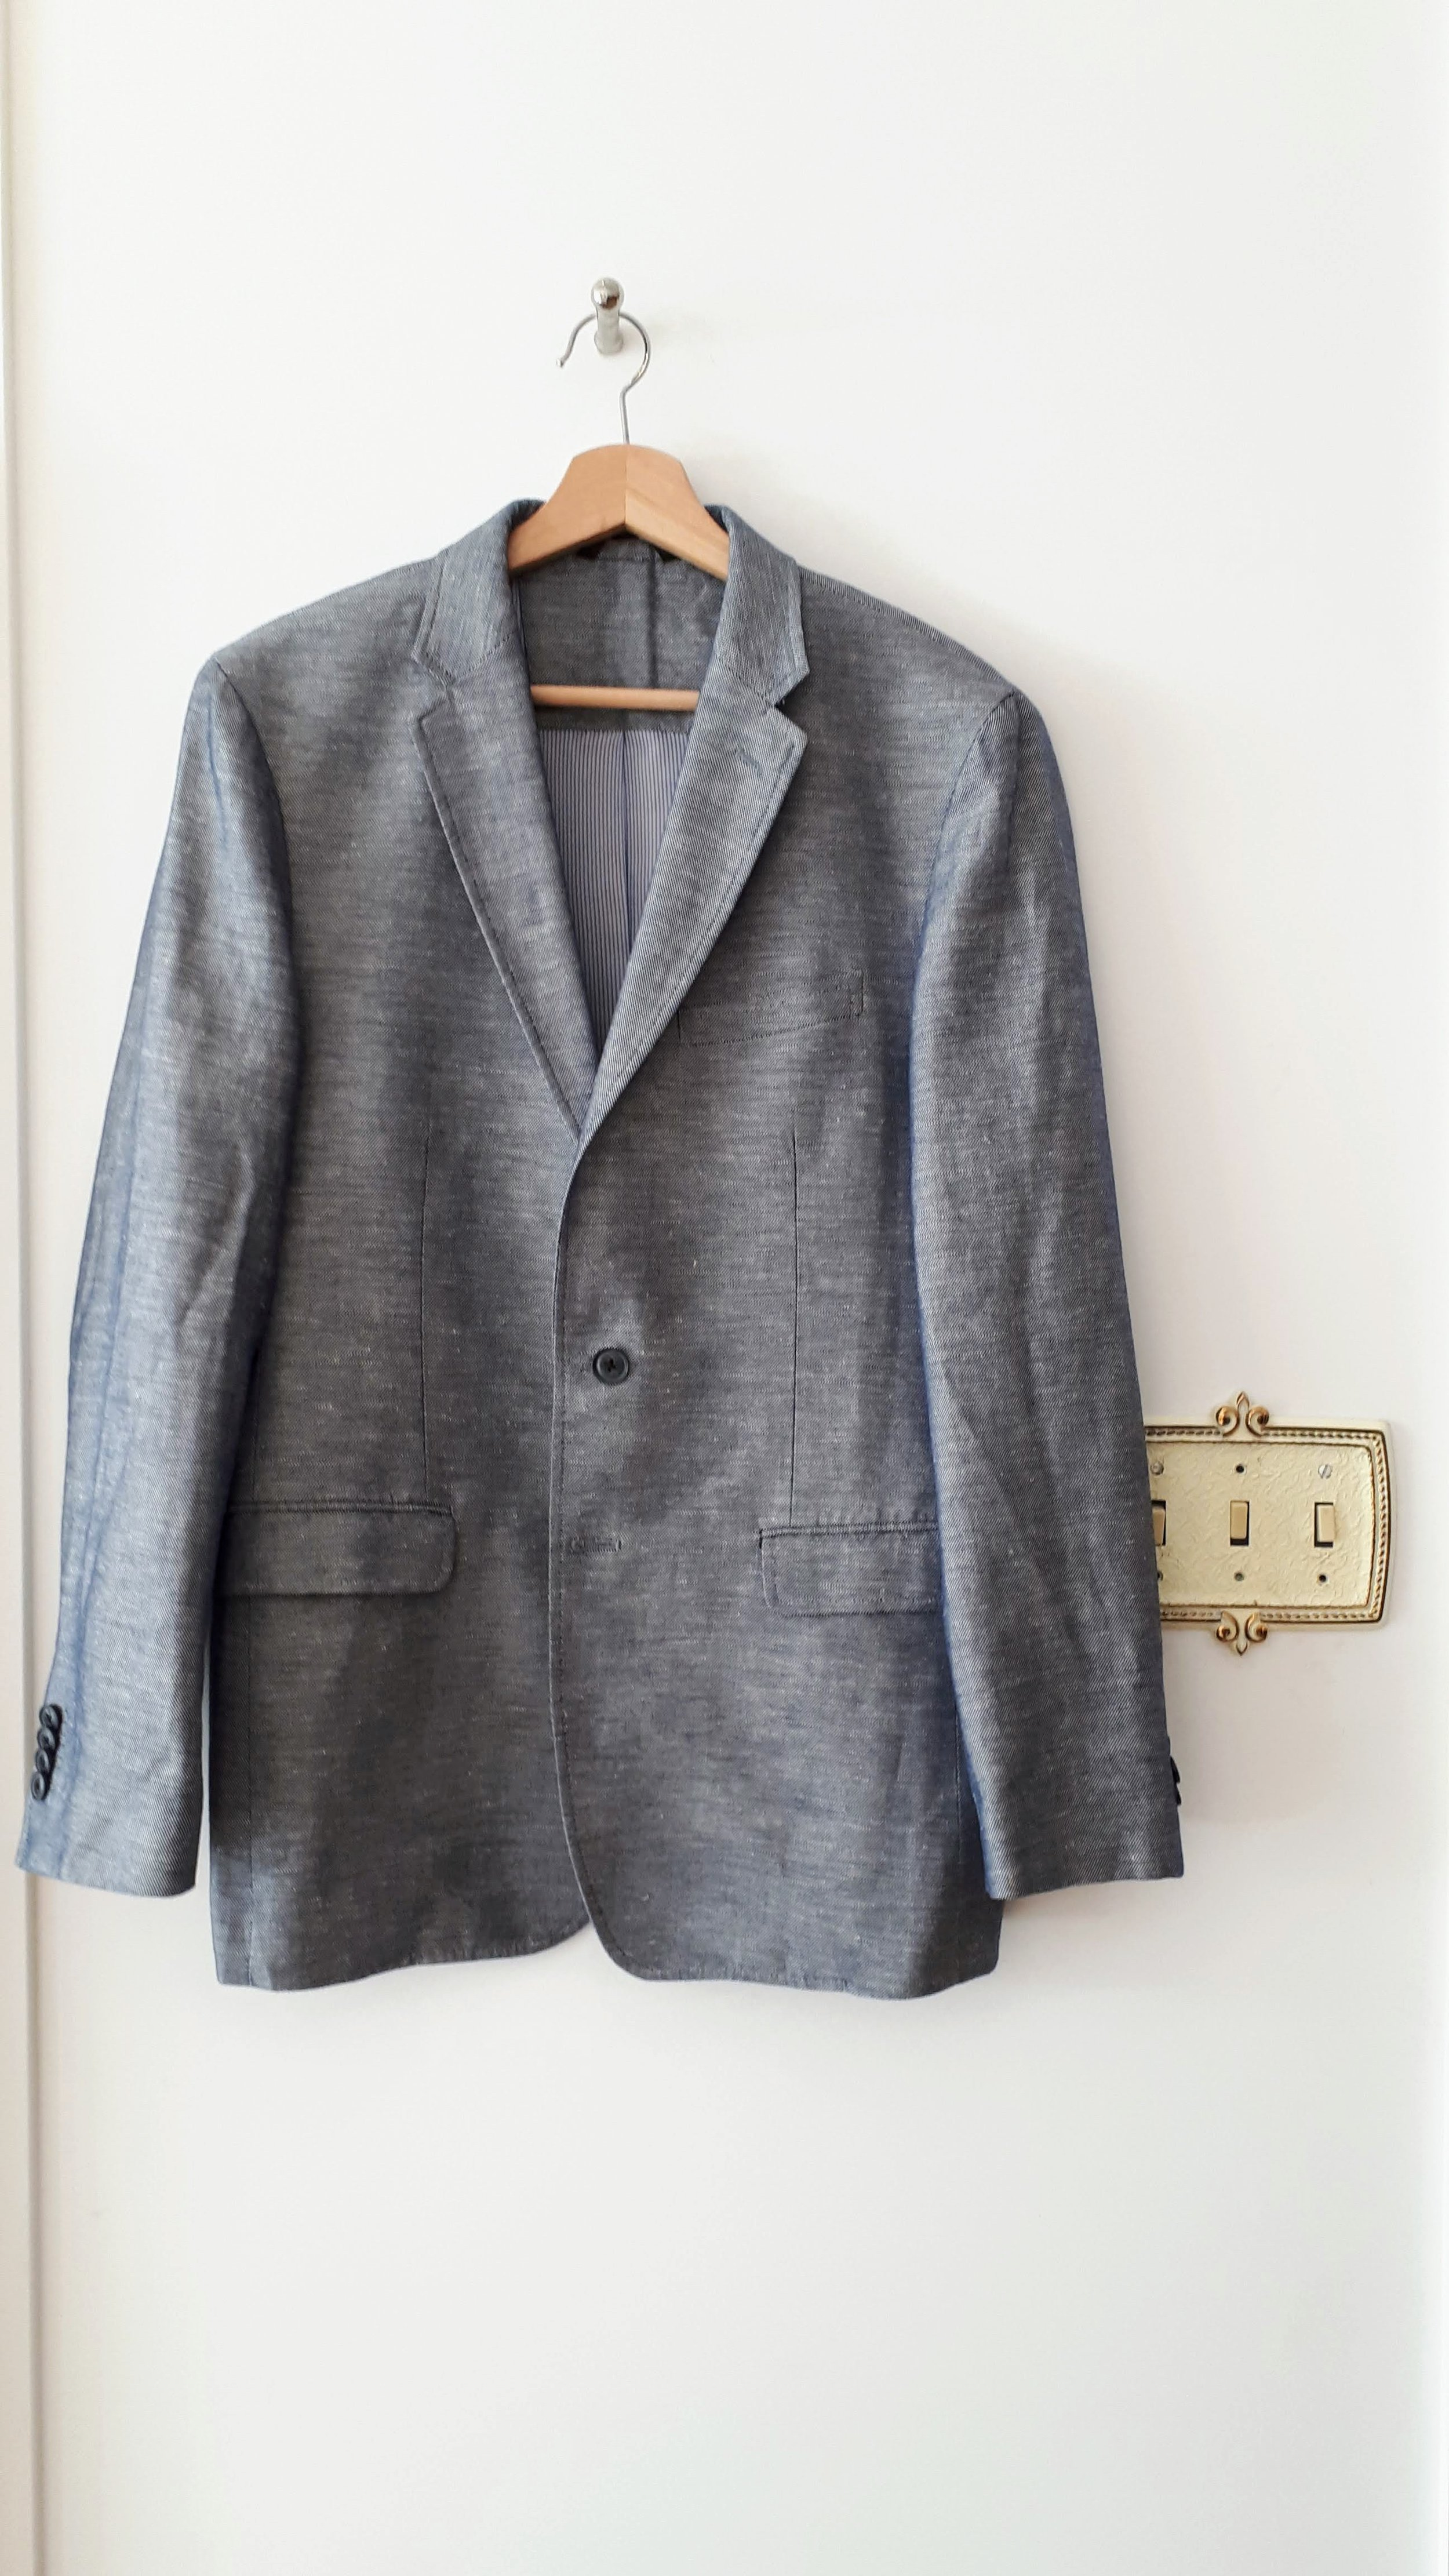 Banana Republic mens blazer; Size 40, $42